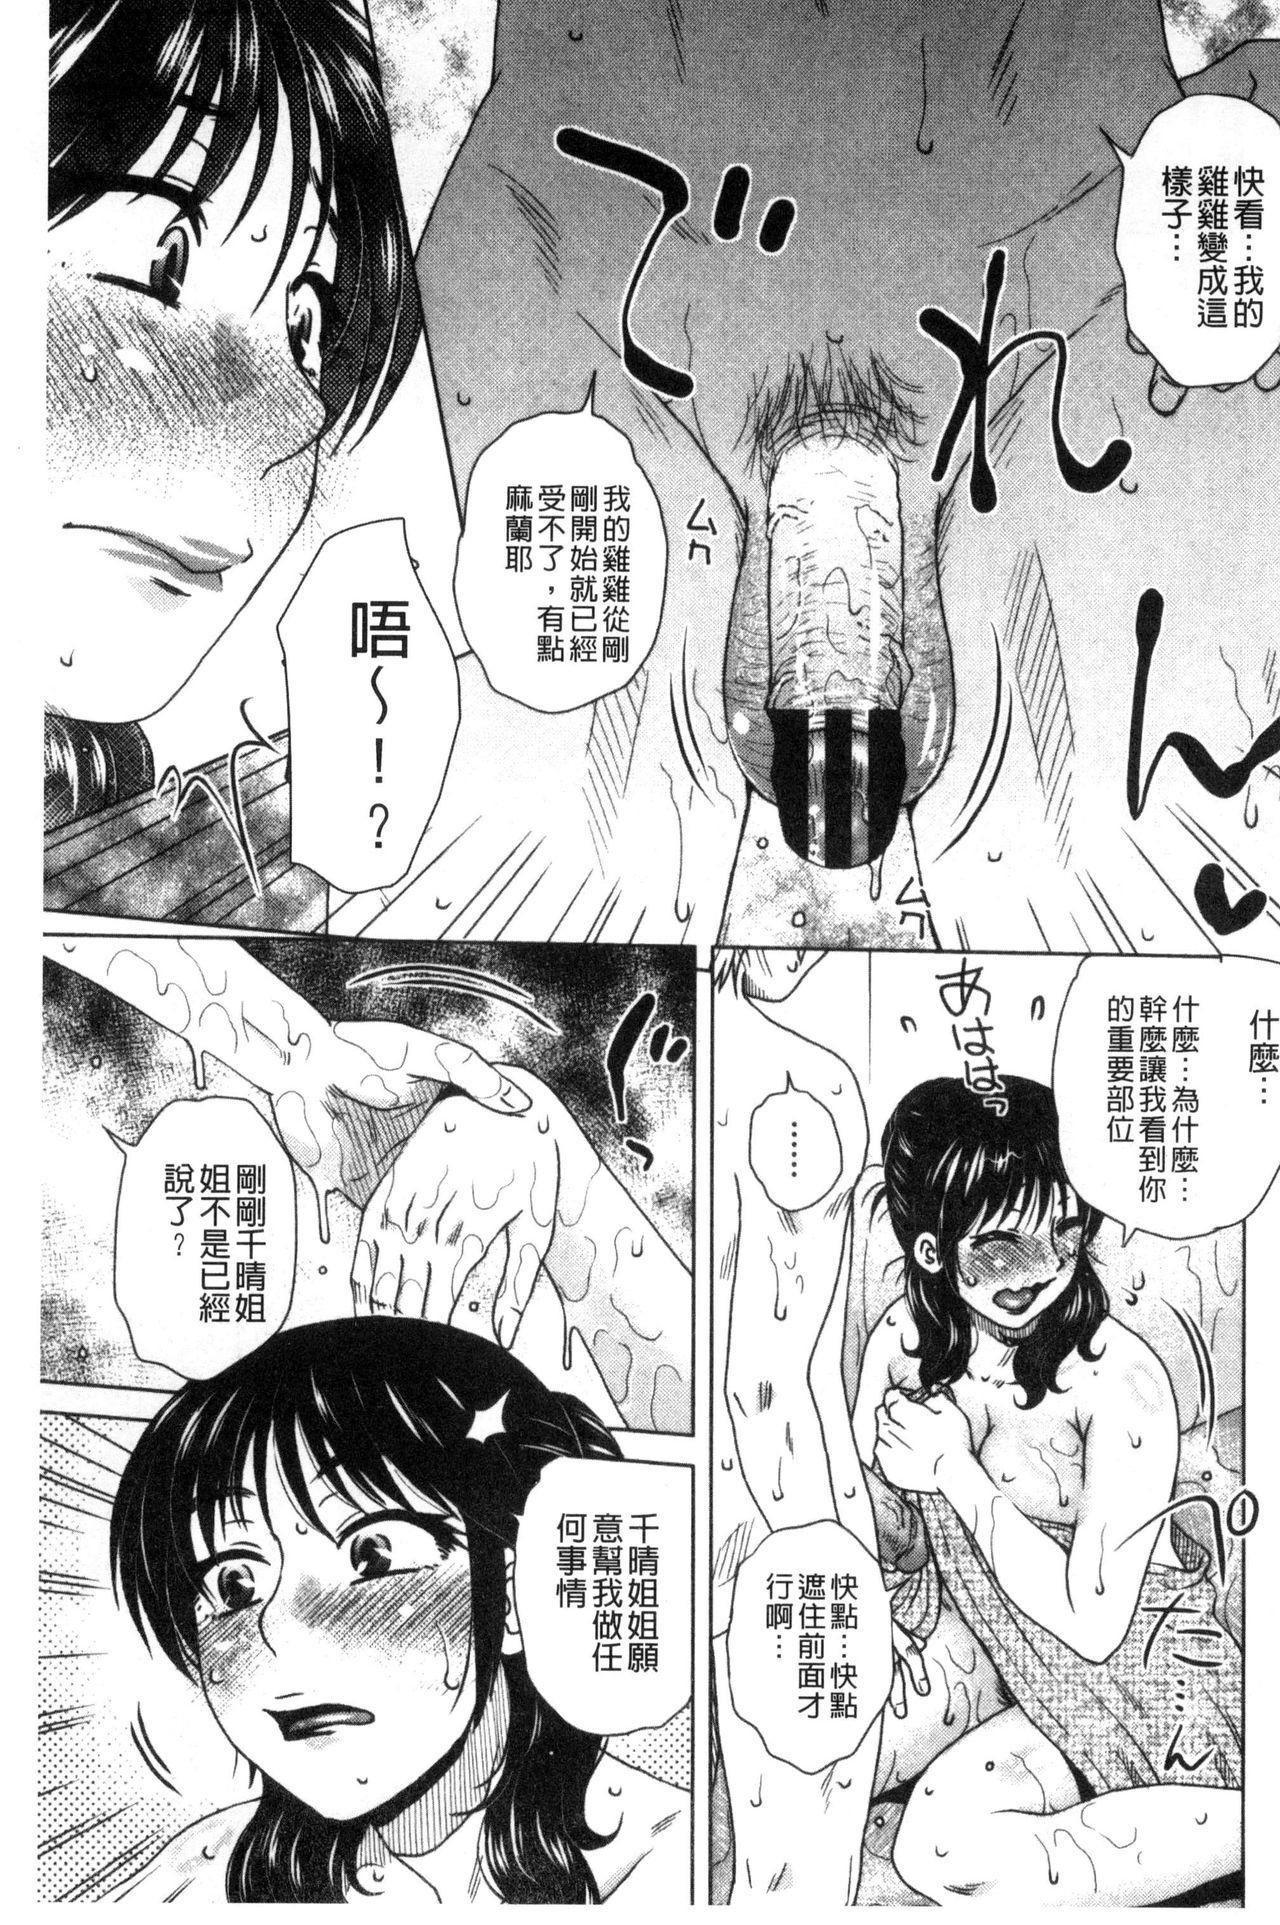 [Kurumiya Mashimin] Uchi no Shachou no Hamedere Inkatsu - Our President is HAME-DERE in Licentious sex life. [Chinese] 173